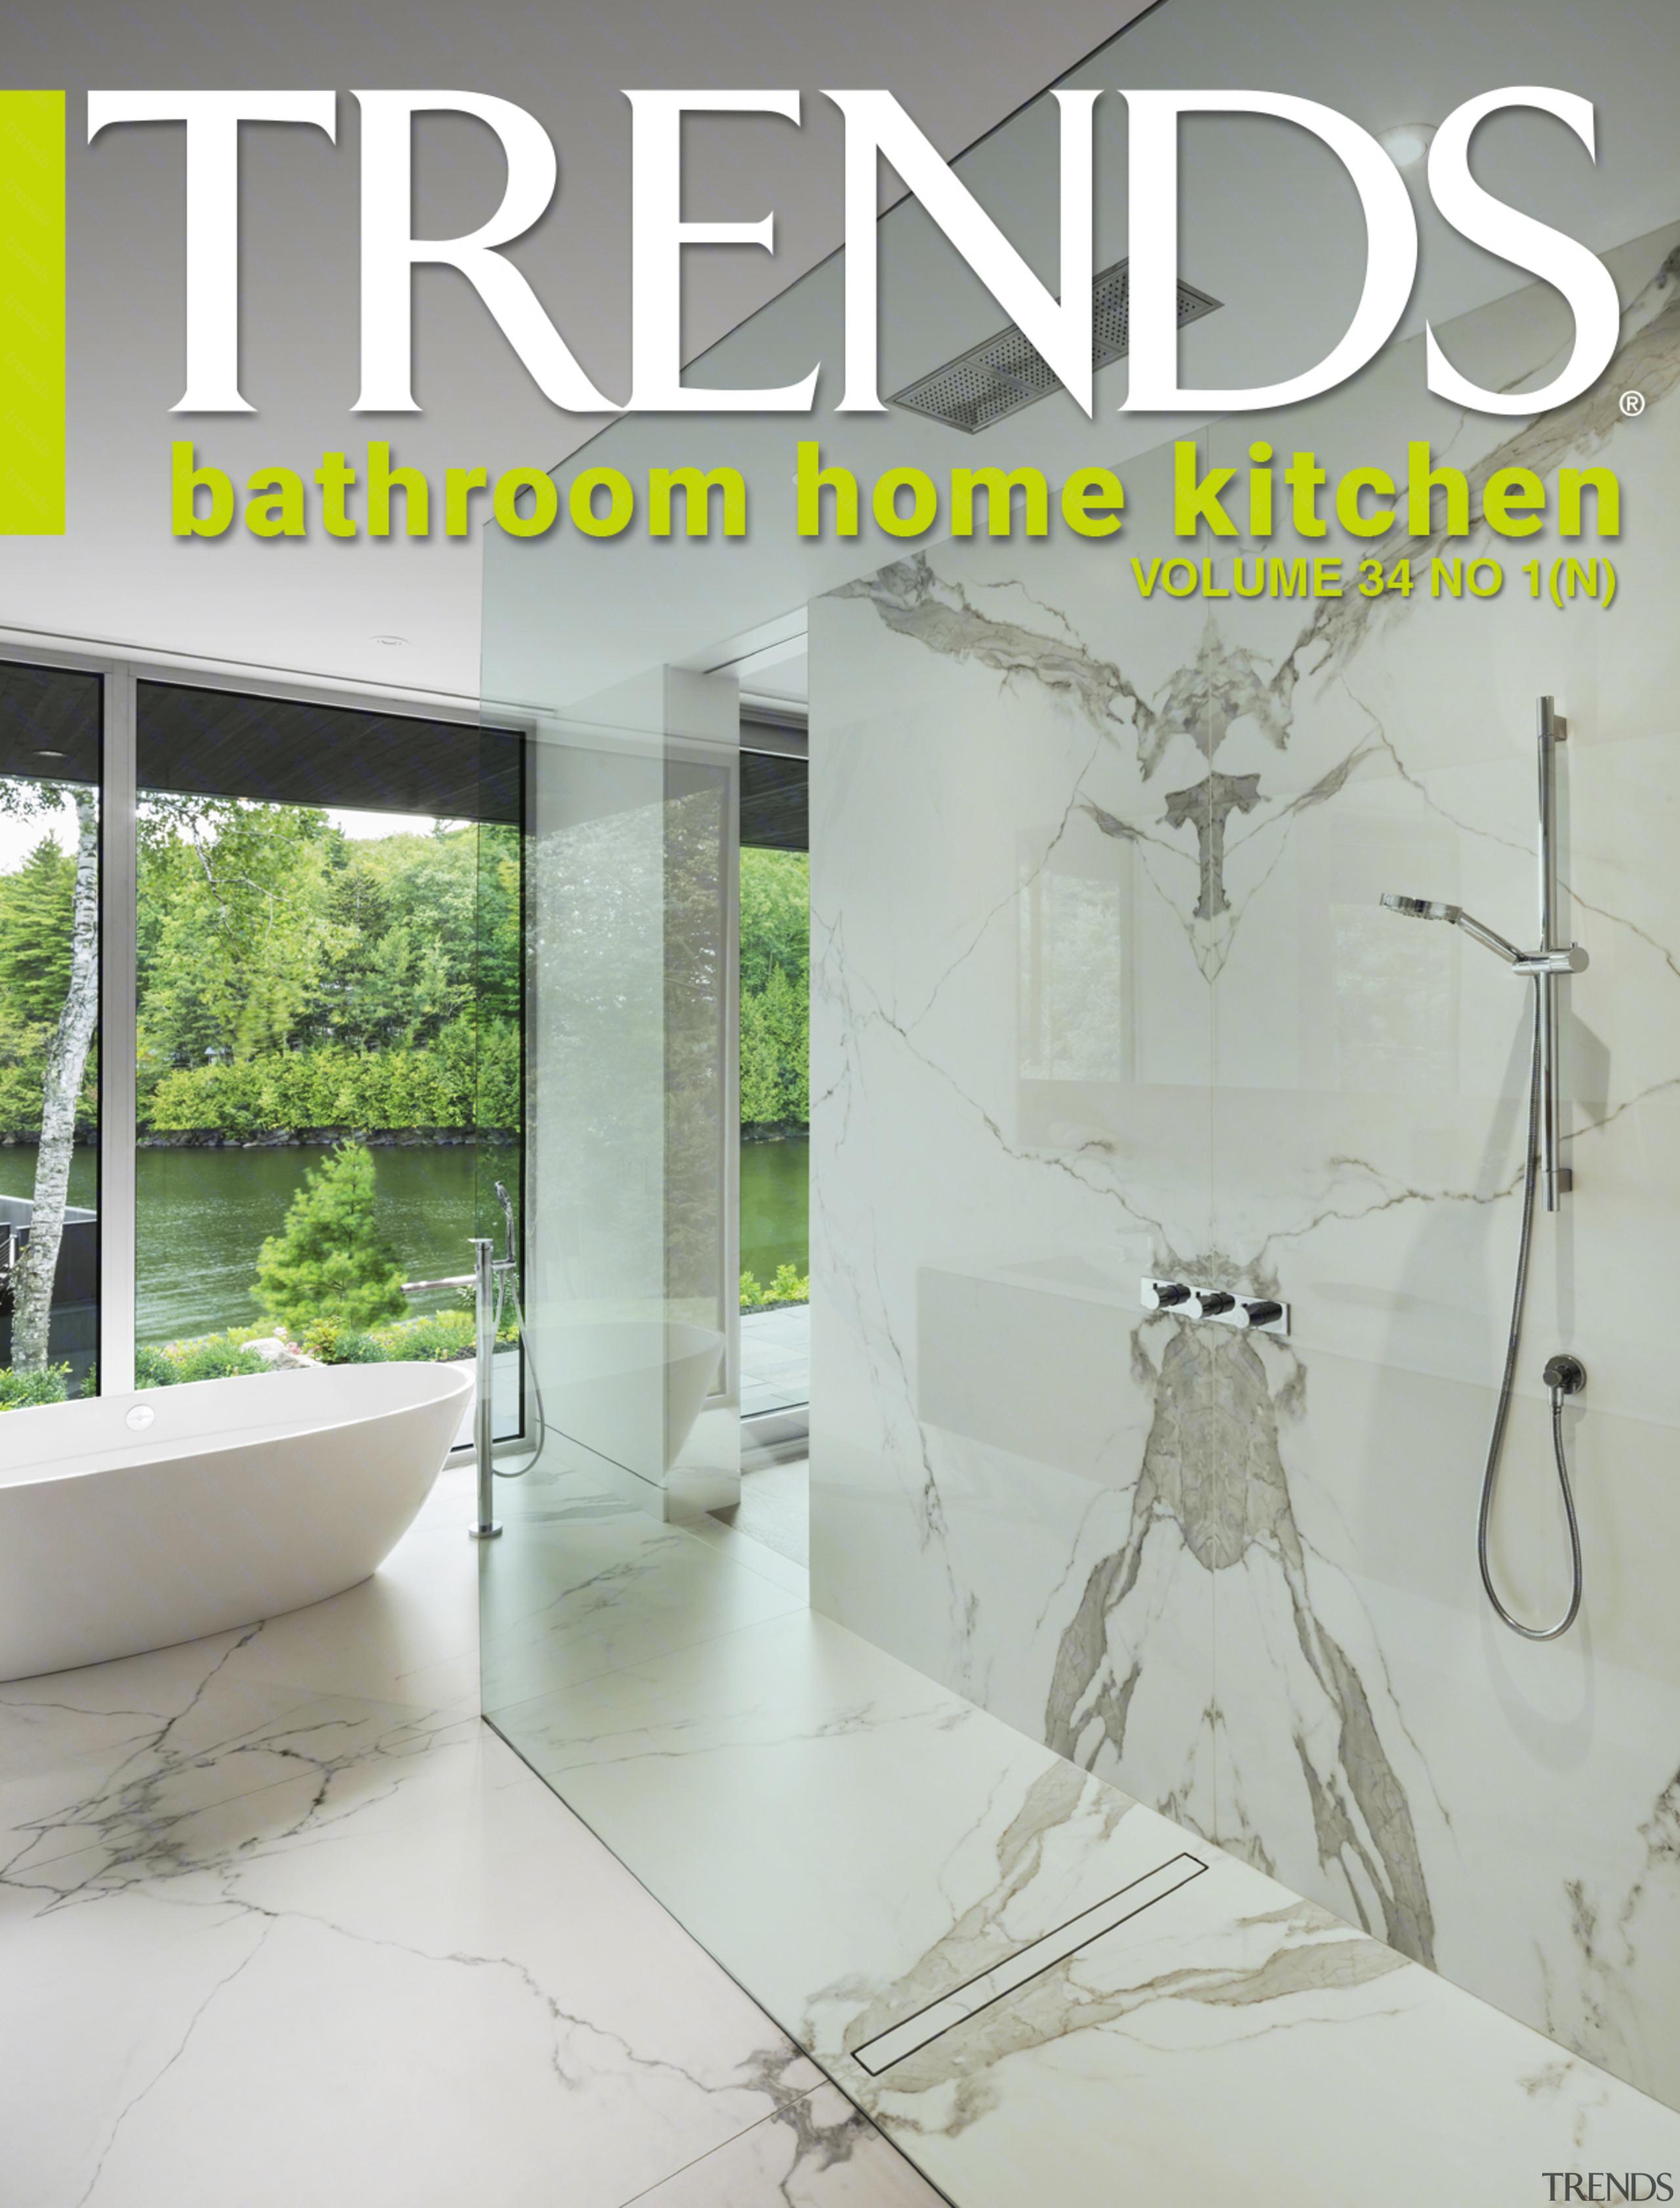 Nz3401 Minicover architecture, floor, flooring, home, interior design, product design, tile, gray